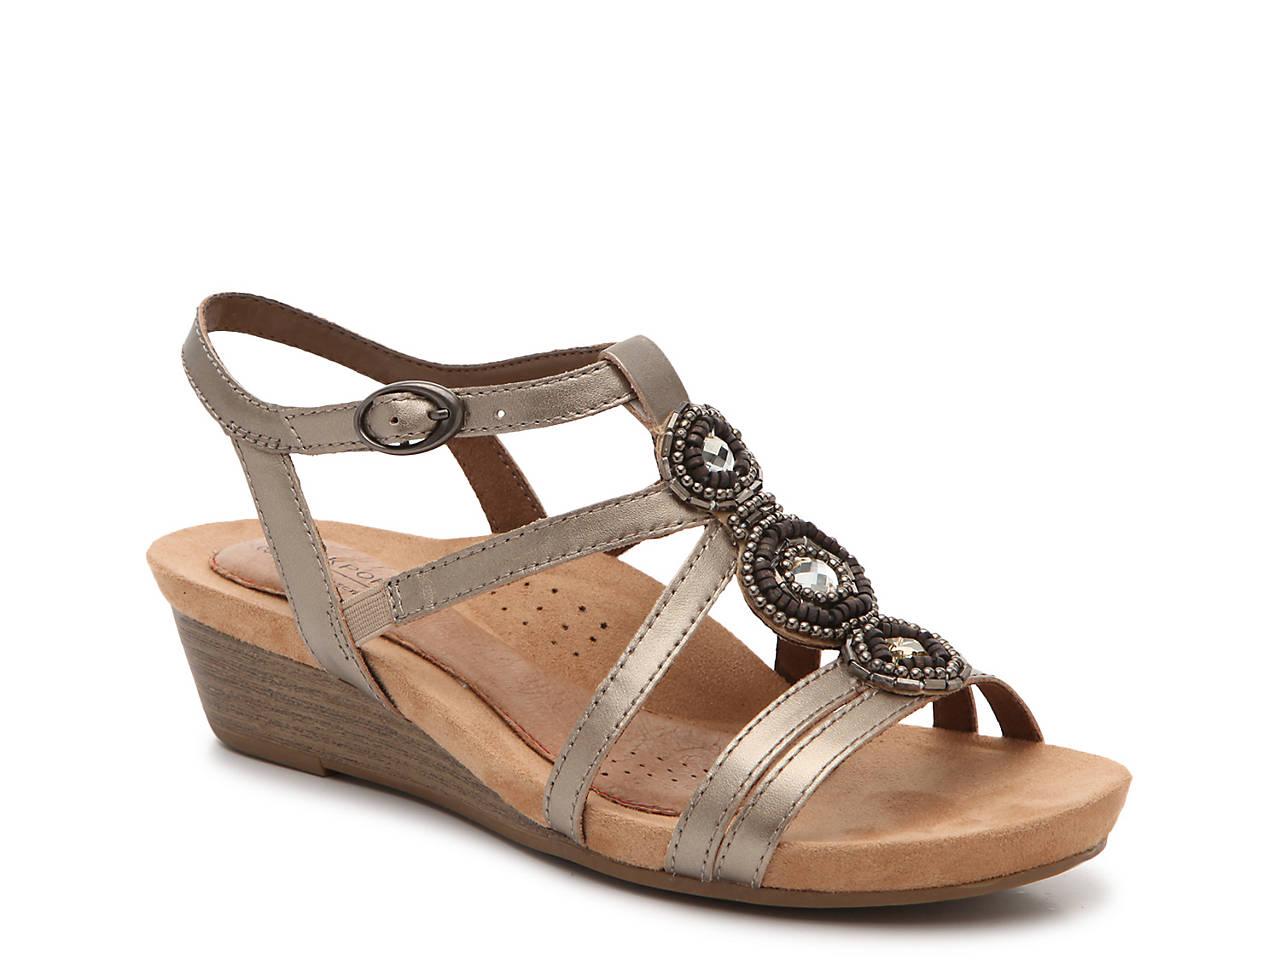 f622d3095 Rockport Cobb Hill Hannah Wedge Sandal Women s Shoes